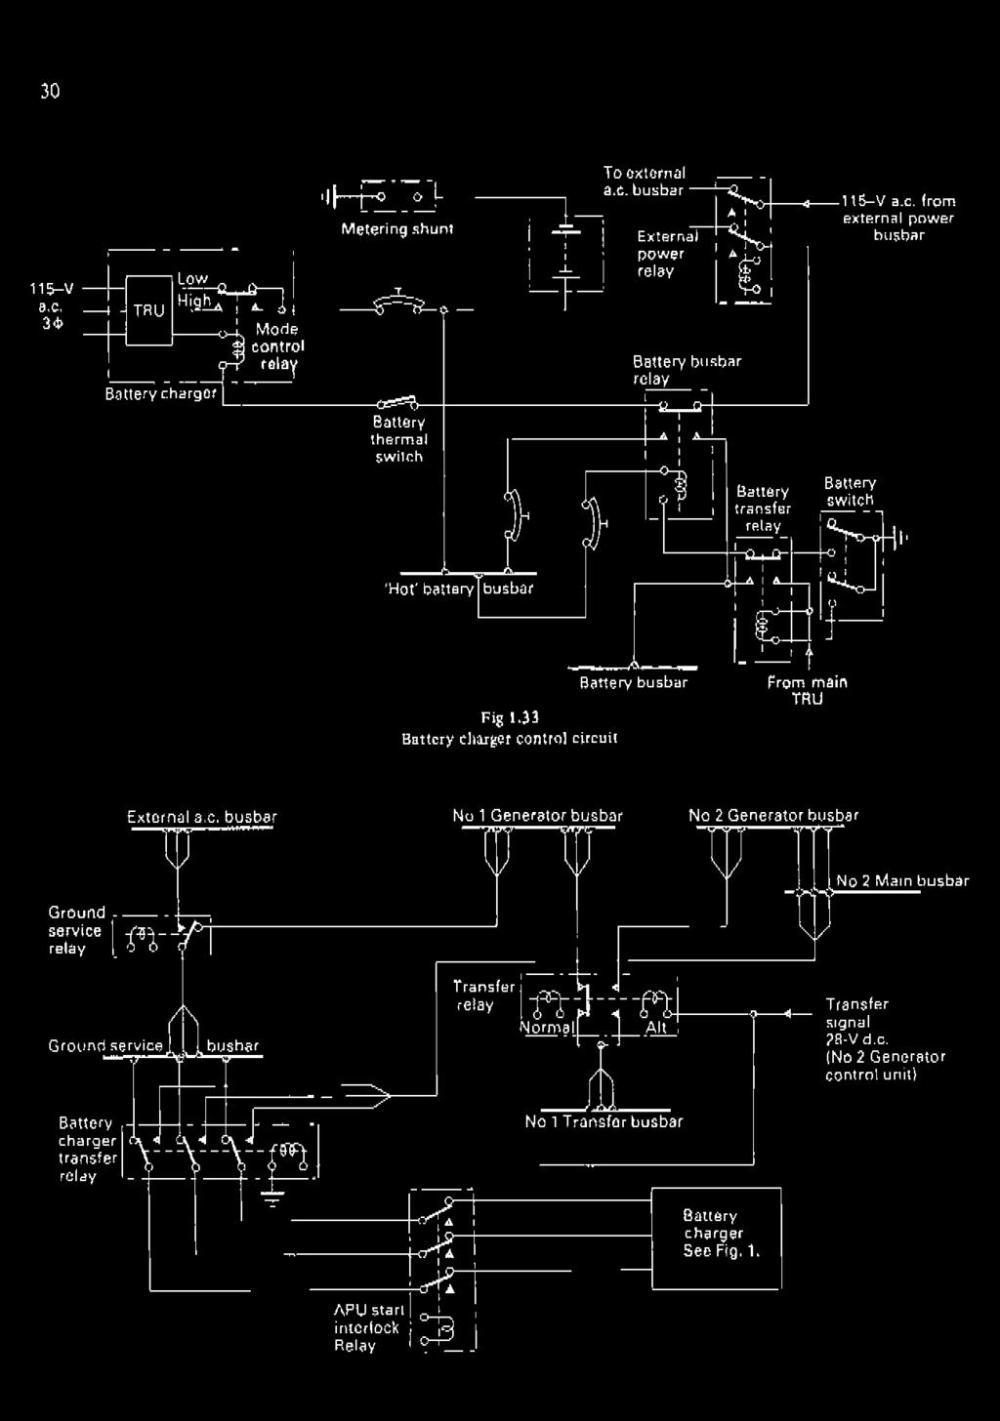 medium resolution of circuit battery busbar from main tru external a c busbar no 1 generator busbar